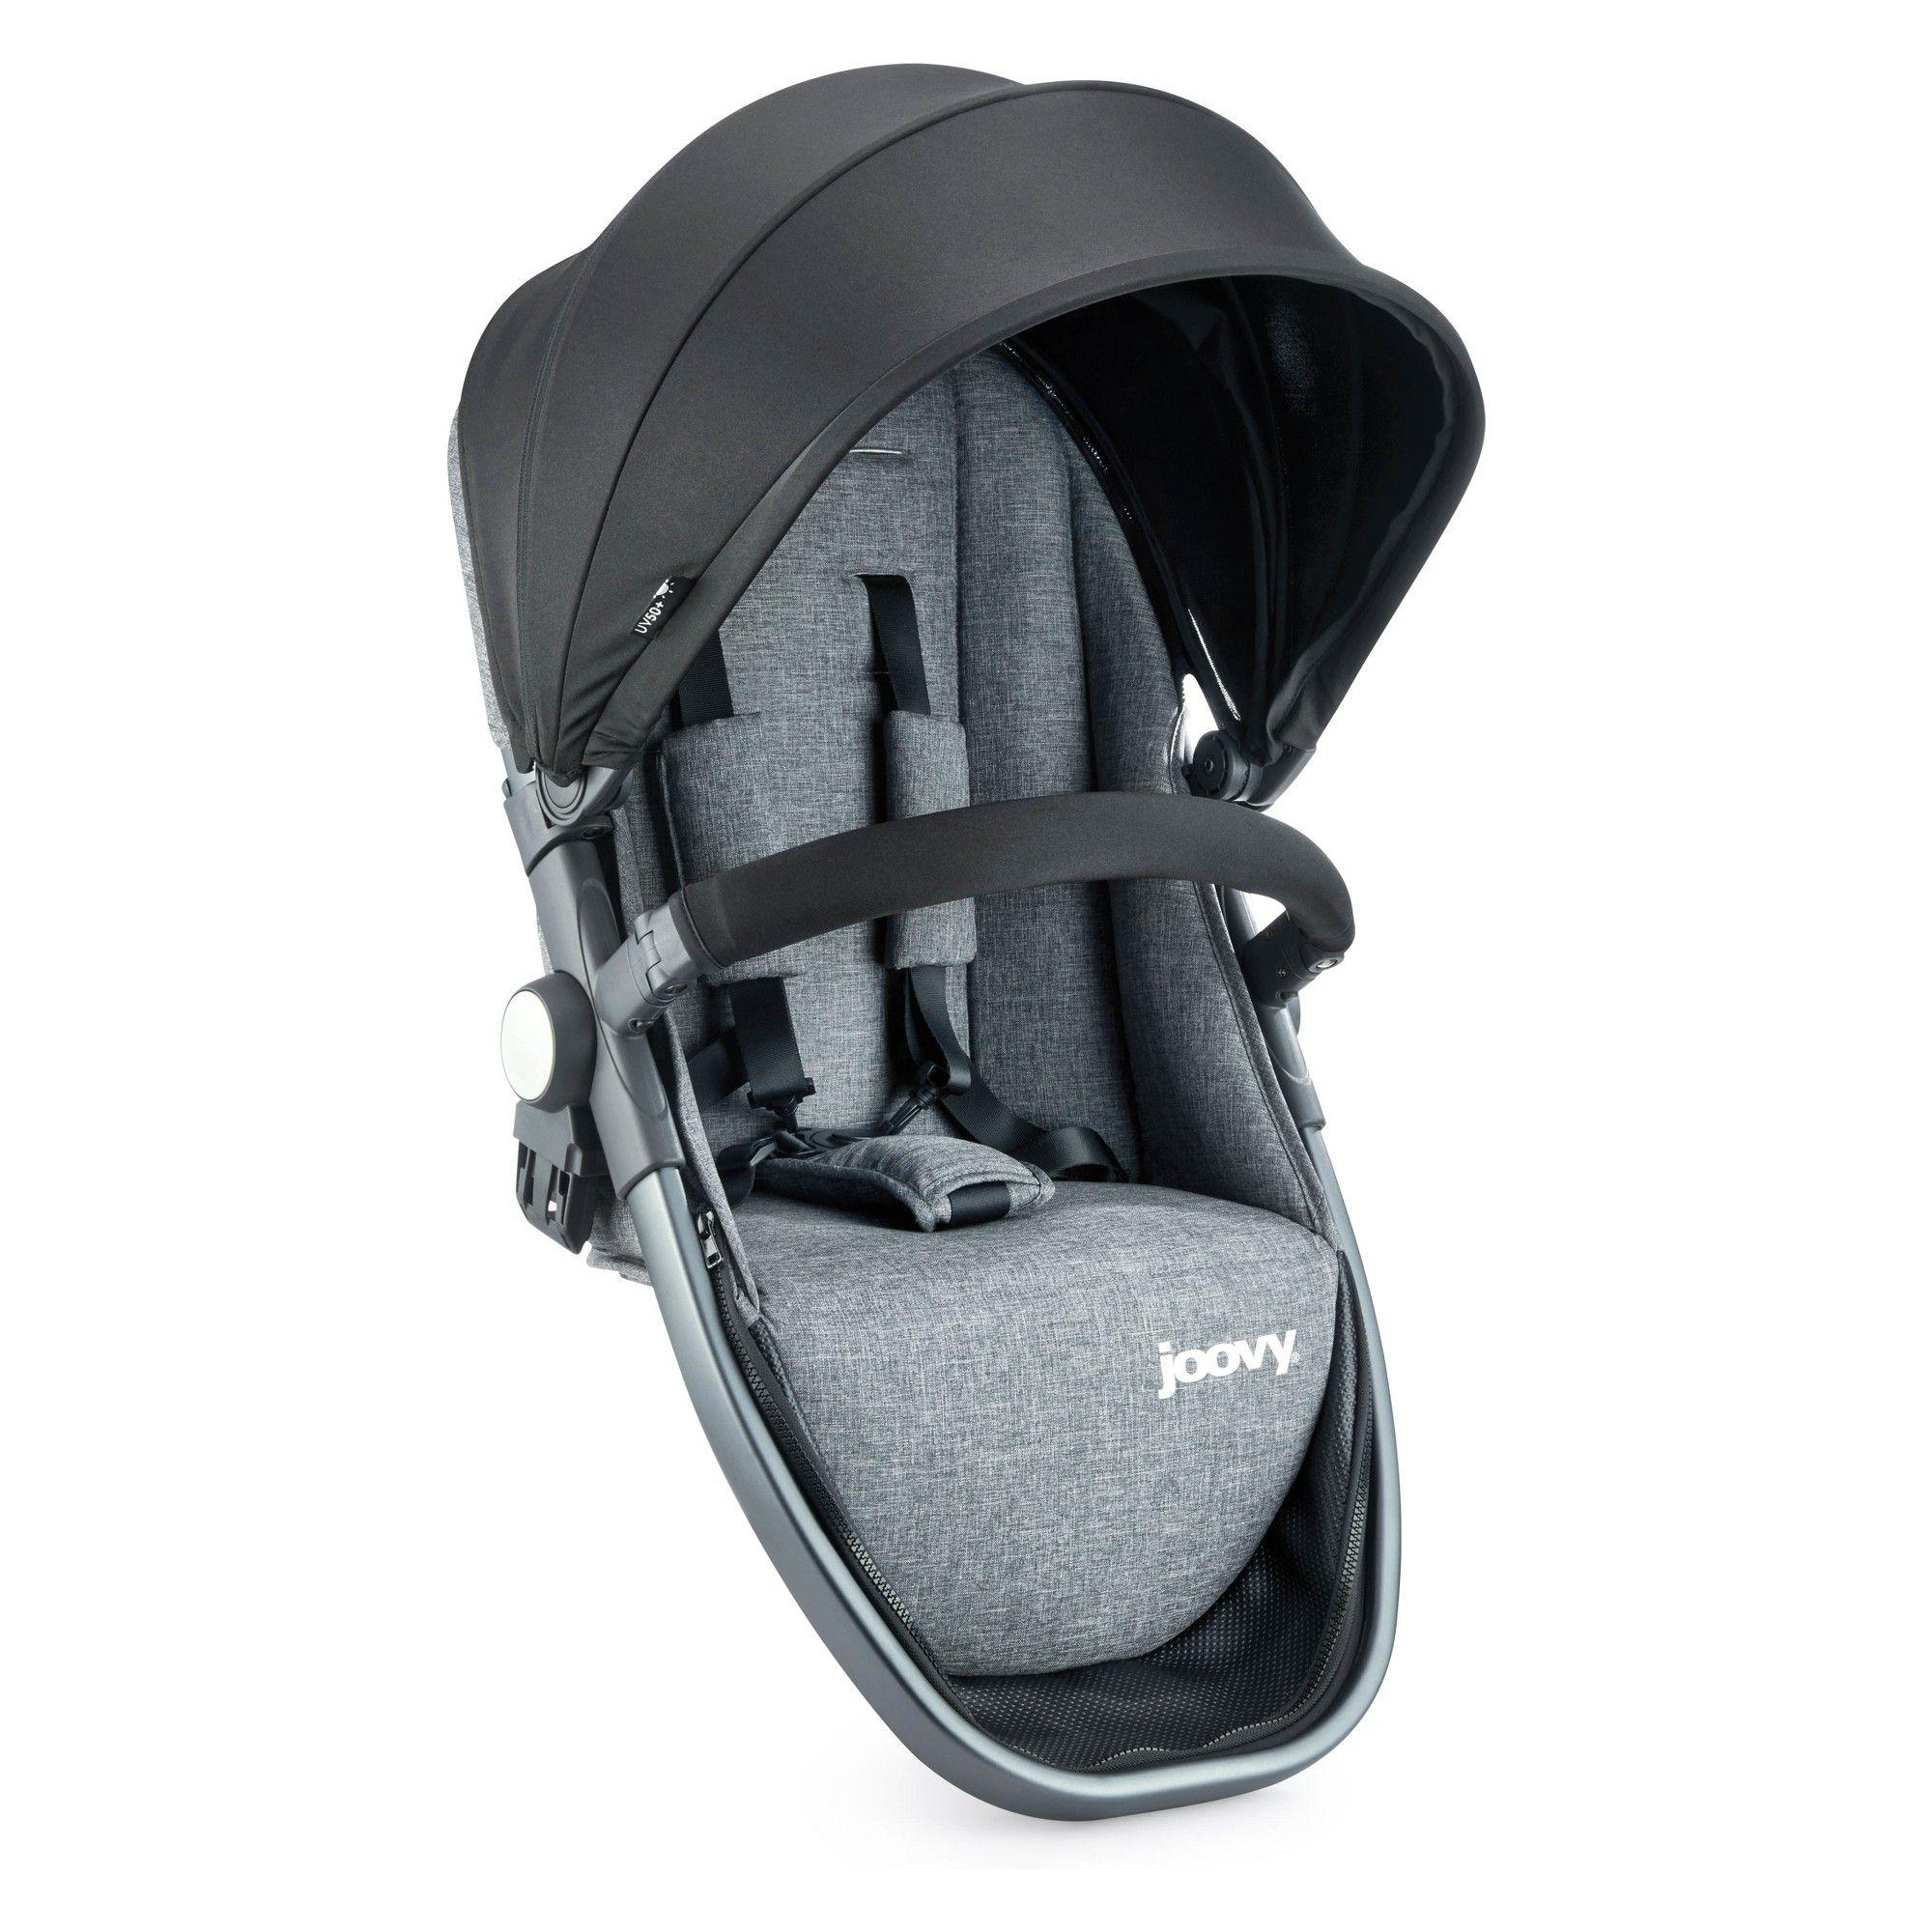 Joovy Qool Second Seat Gray Melange Stroller cover